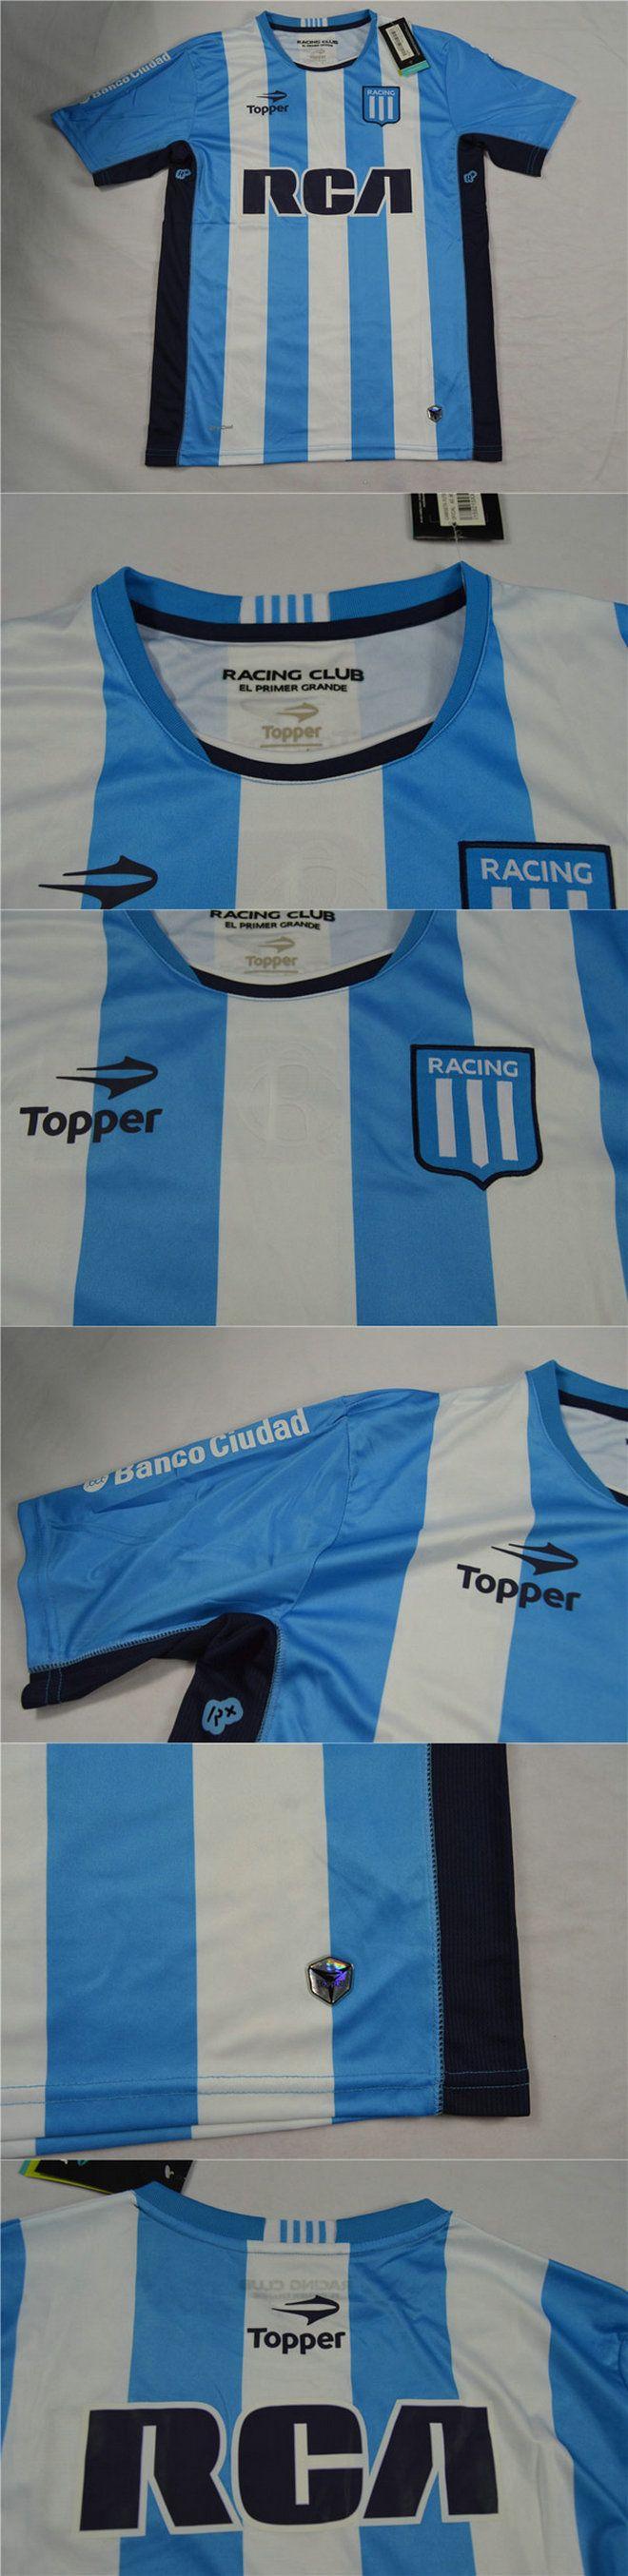 Cheap Soccer Jerseys Argentine Primera División Racing Club de Avellaneda Home Jersey Shirt 2016-2017 hotclubjersey.com